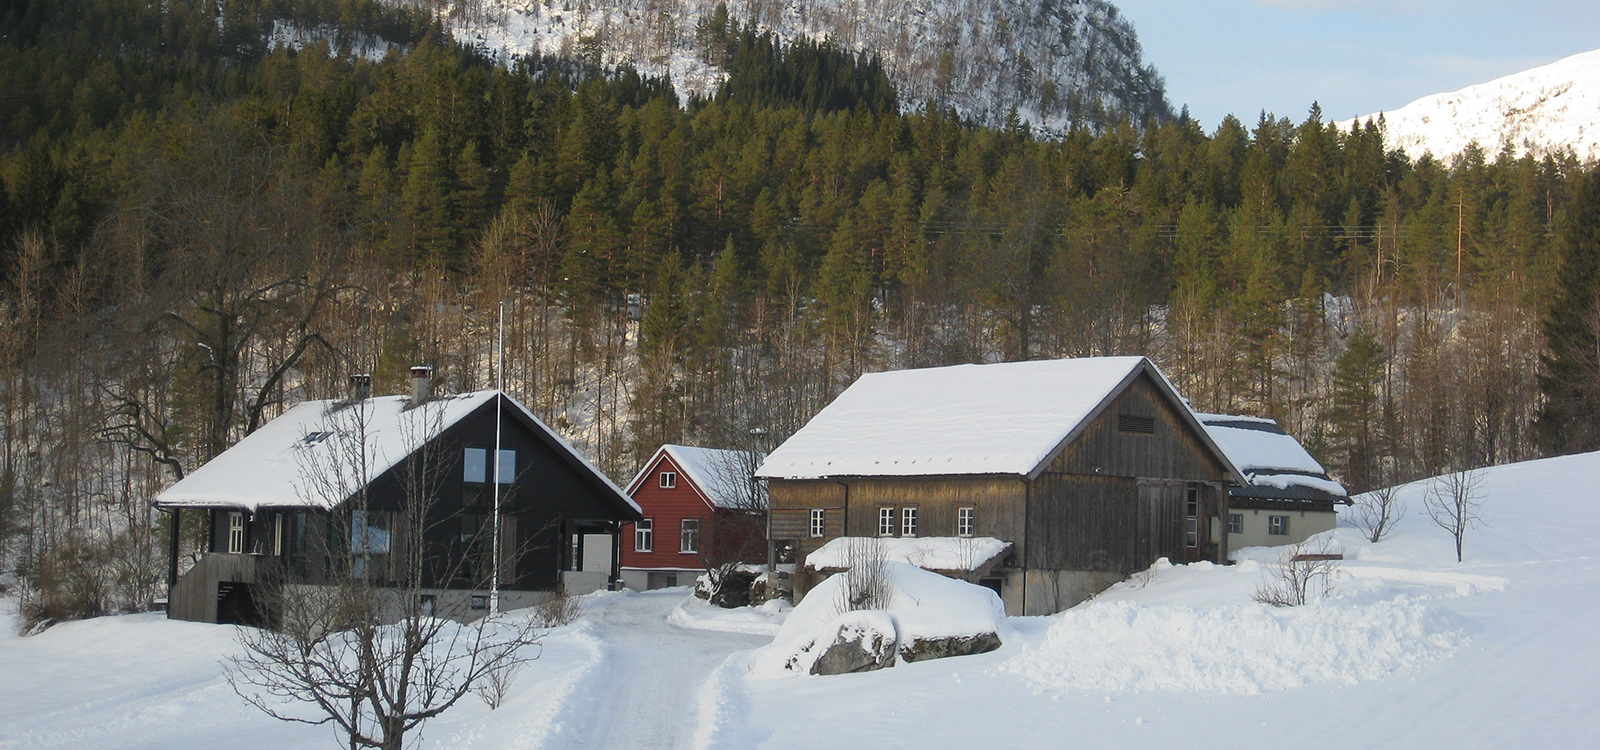 Fjordamattunet vinter